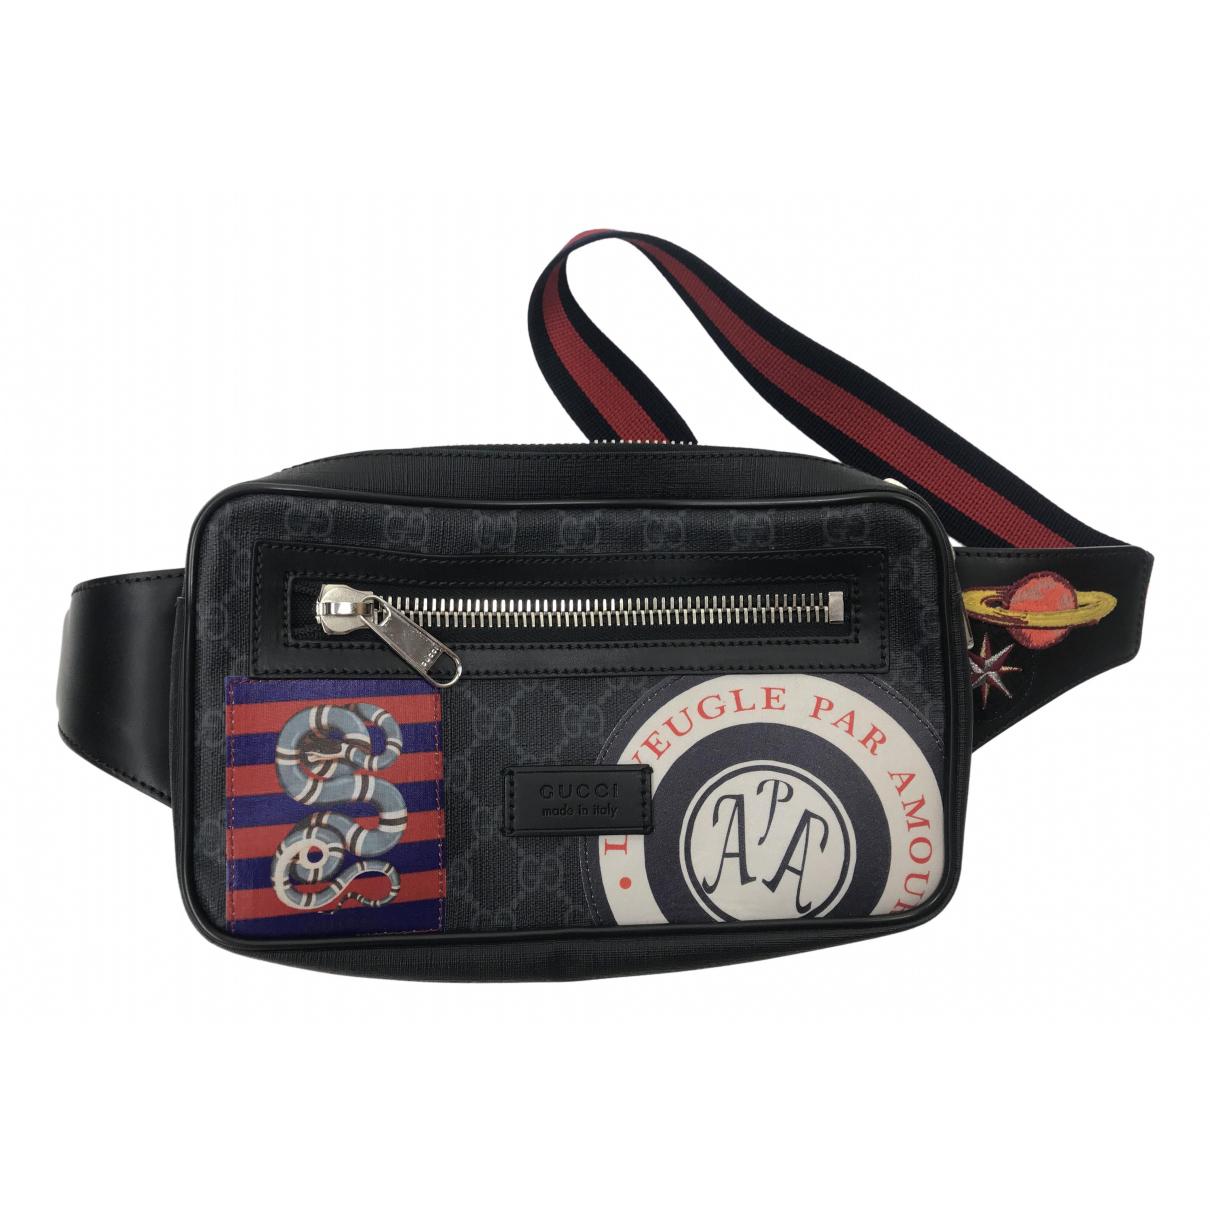 Gucci N Black Cloth Small bag, wallet & cases for Men N